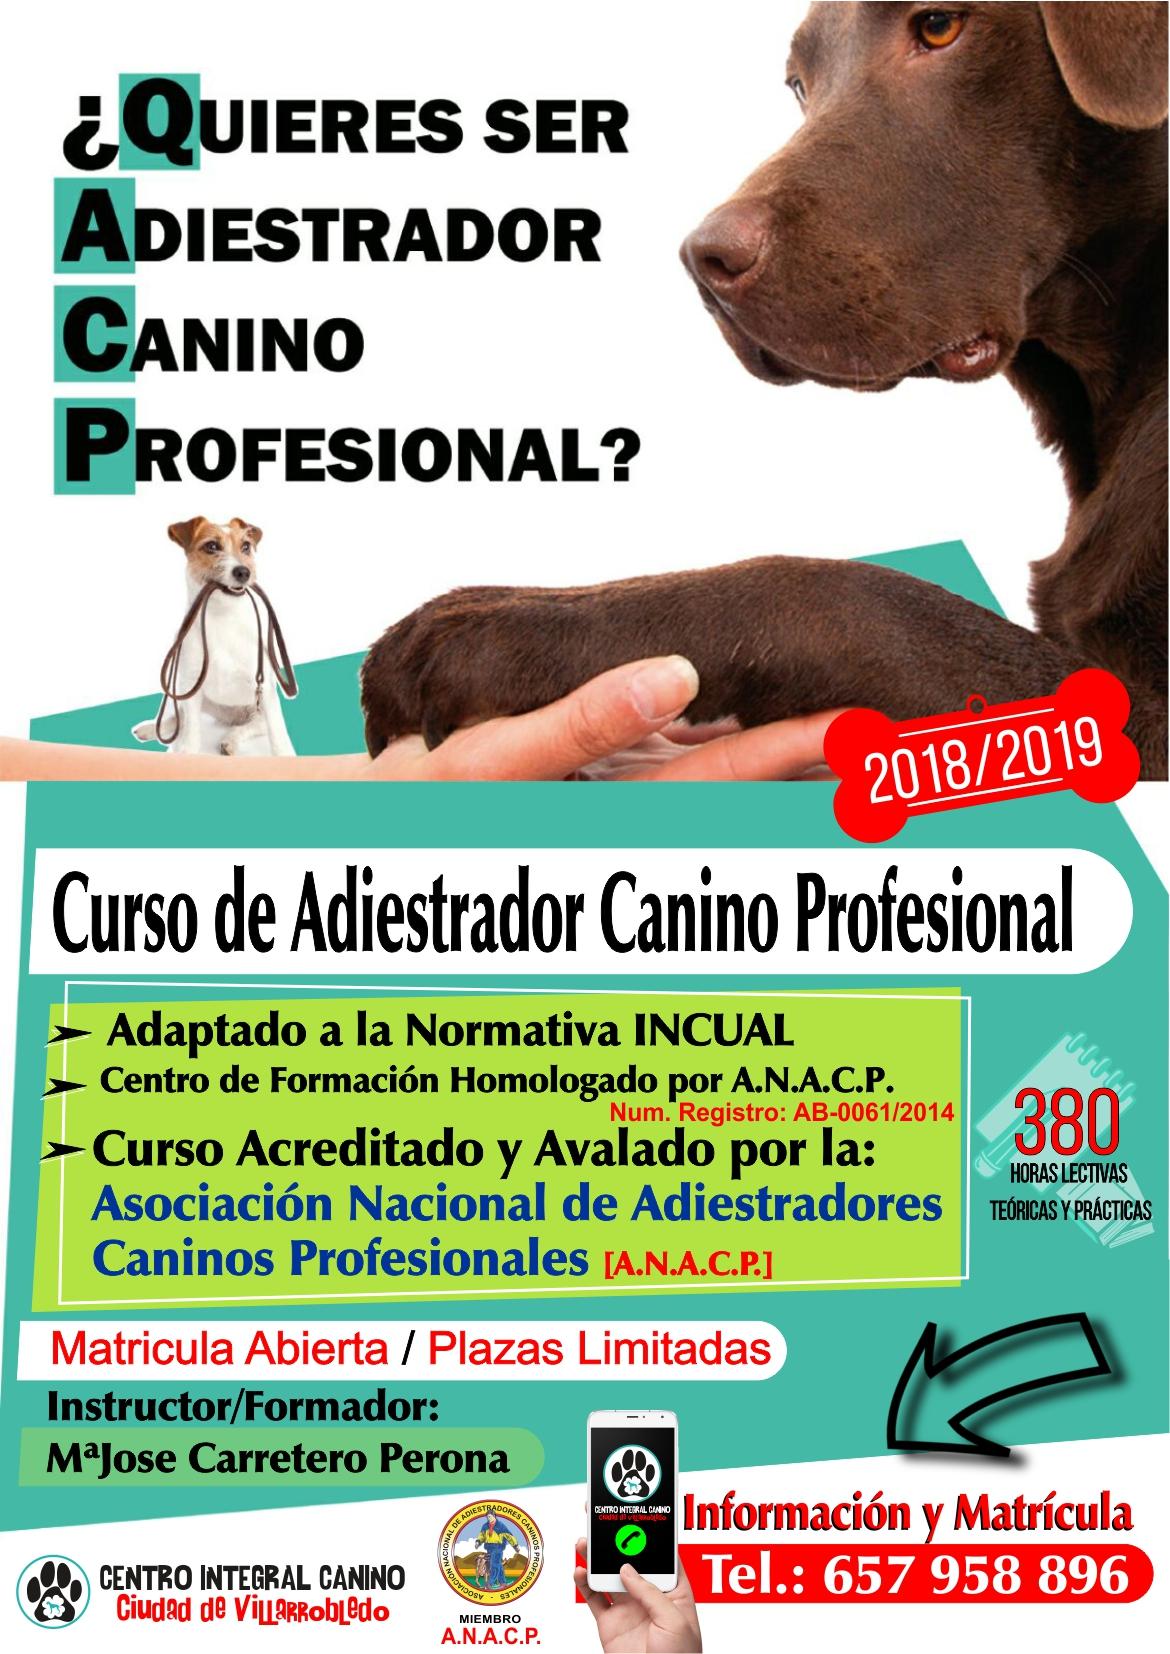 Curso de Adiestrador Canino Profesional